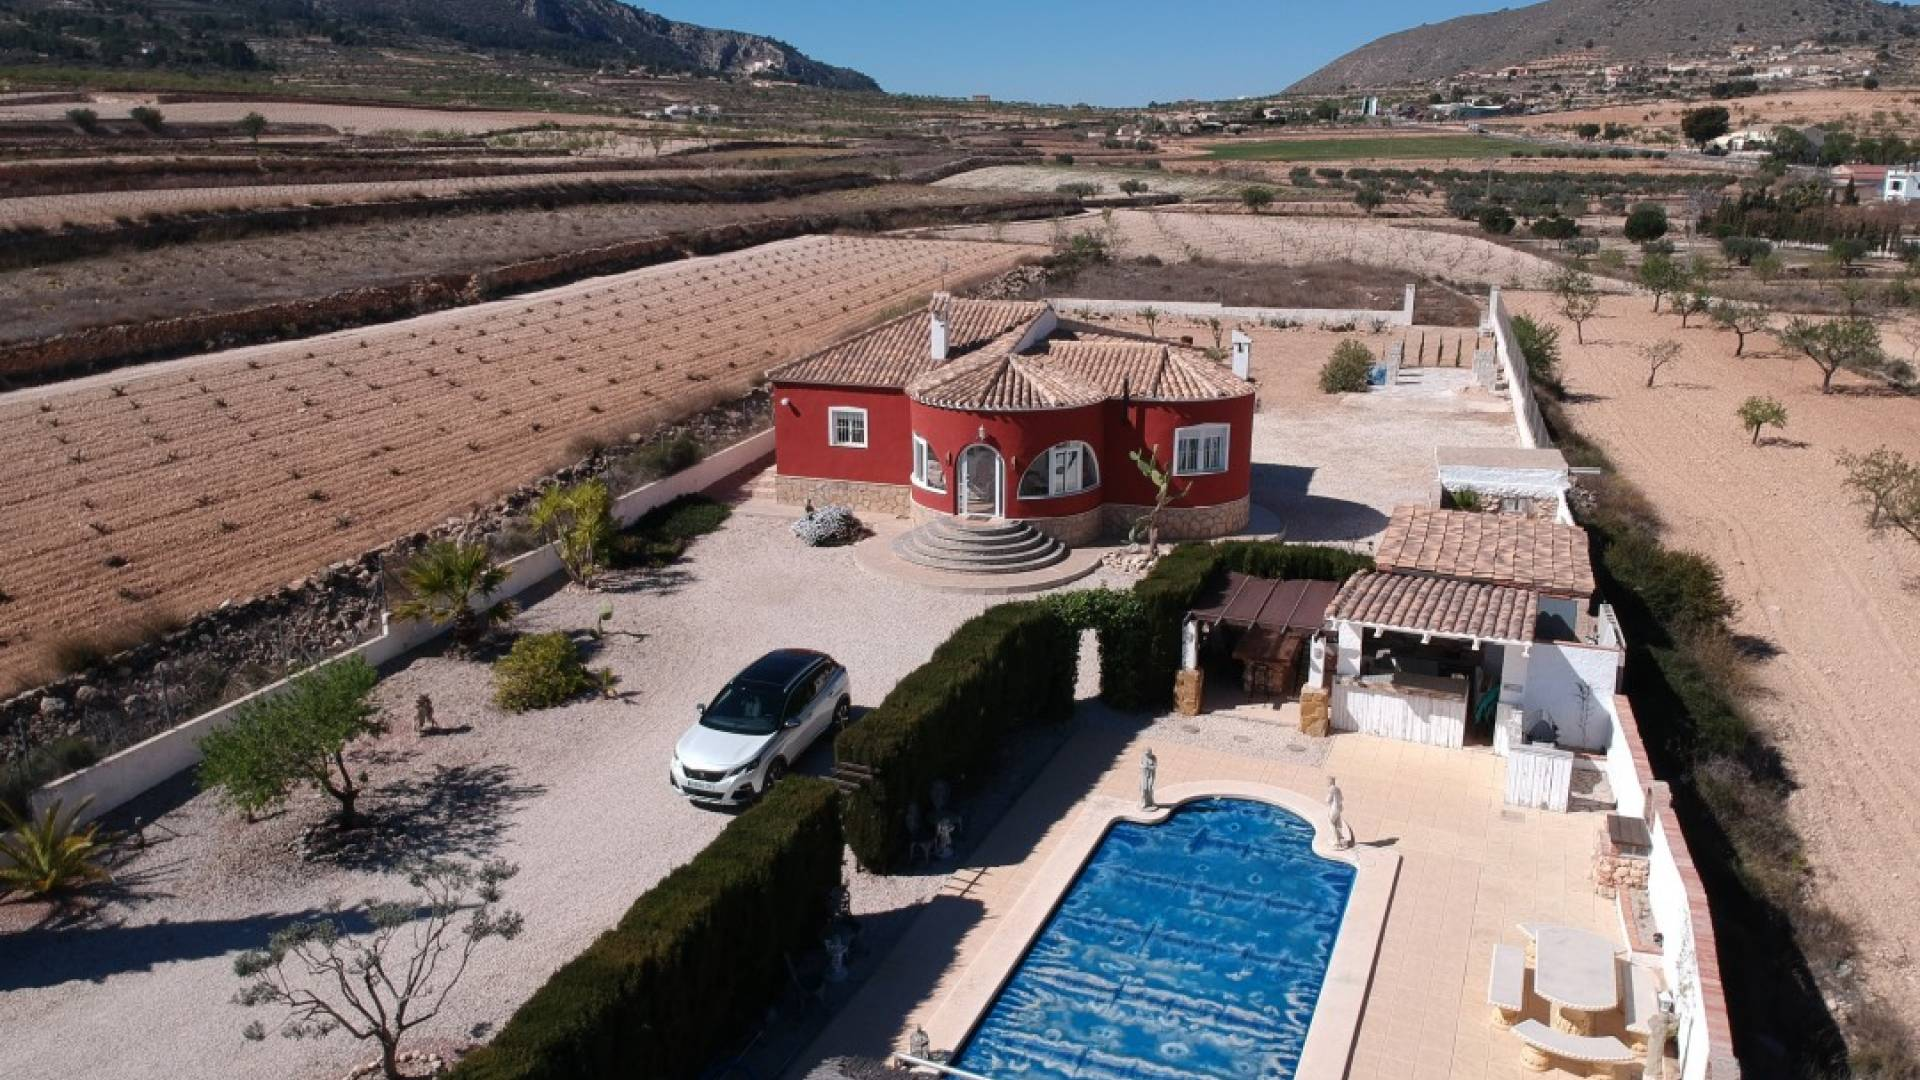 3 bedroom house / villa for sale in La Romana, Costa Blanca